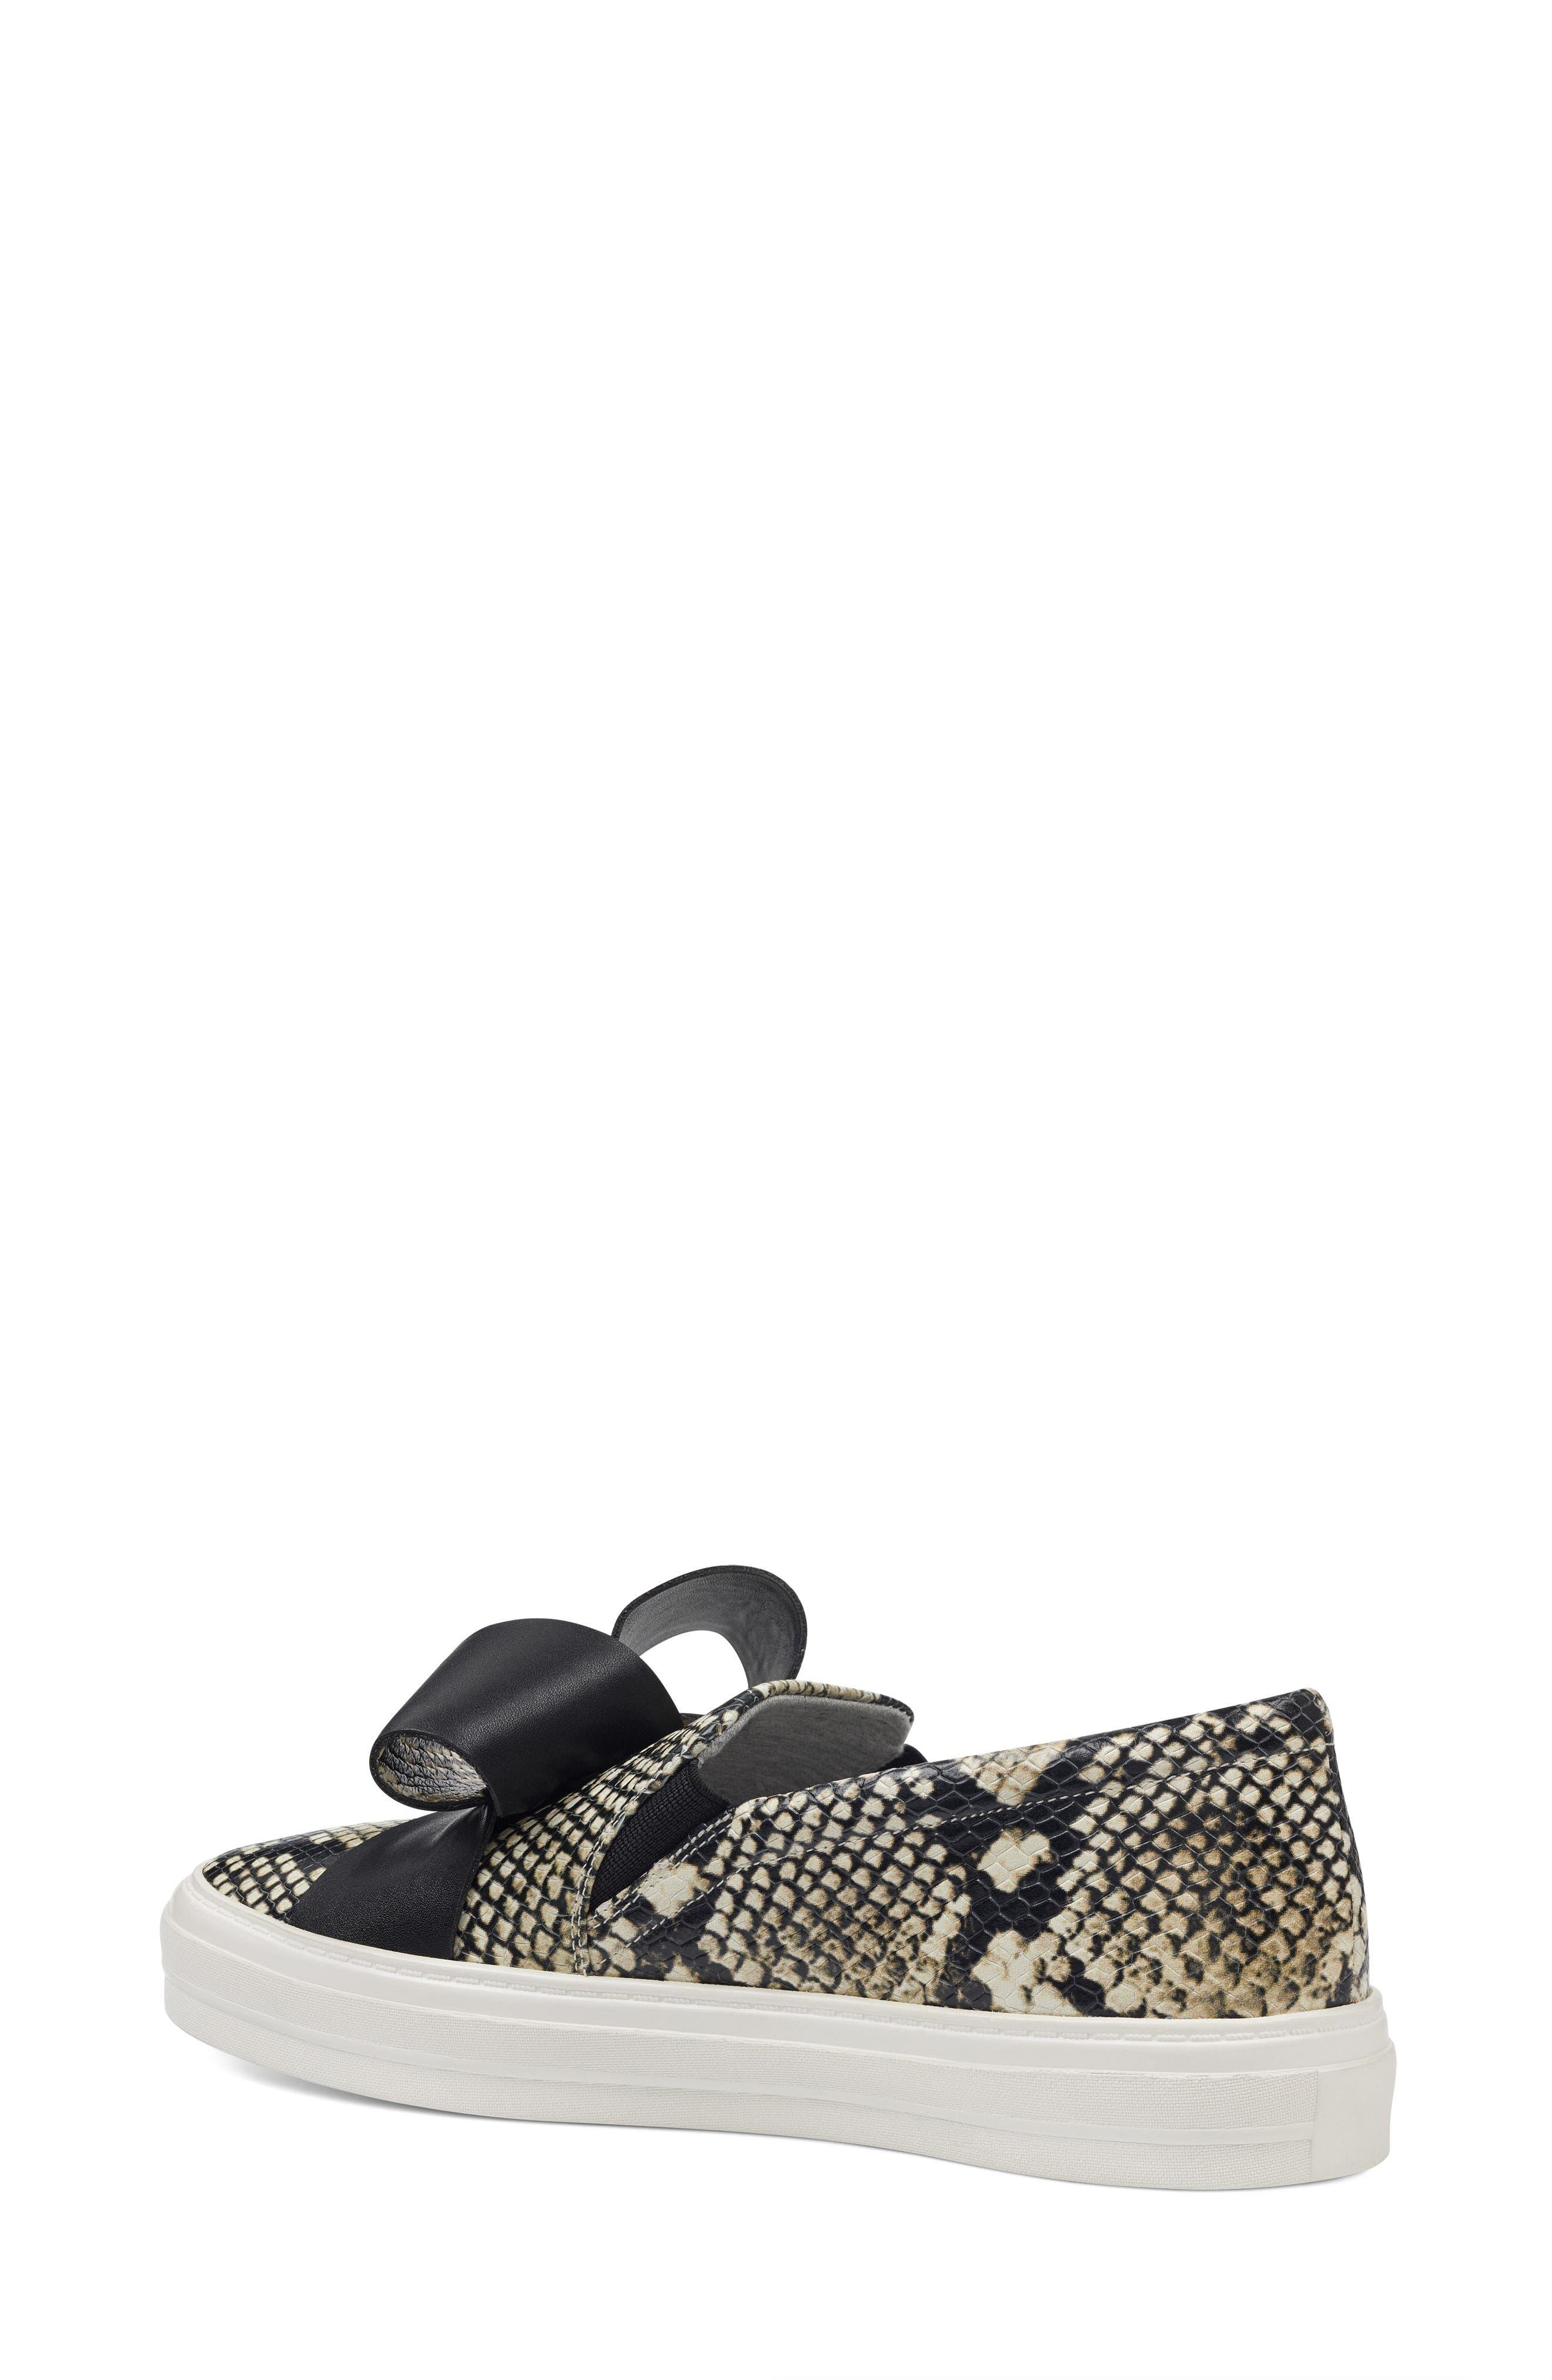 Odienella Slip-On Sneaker,                             Alternate thumbnail 2, color,                             Off White Multi Leather